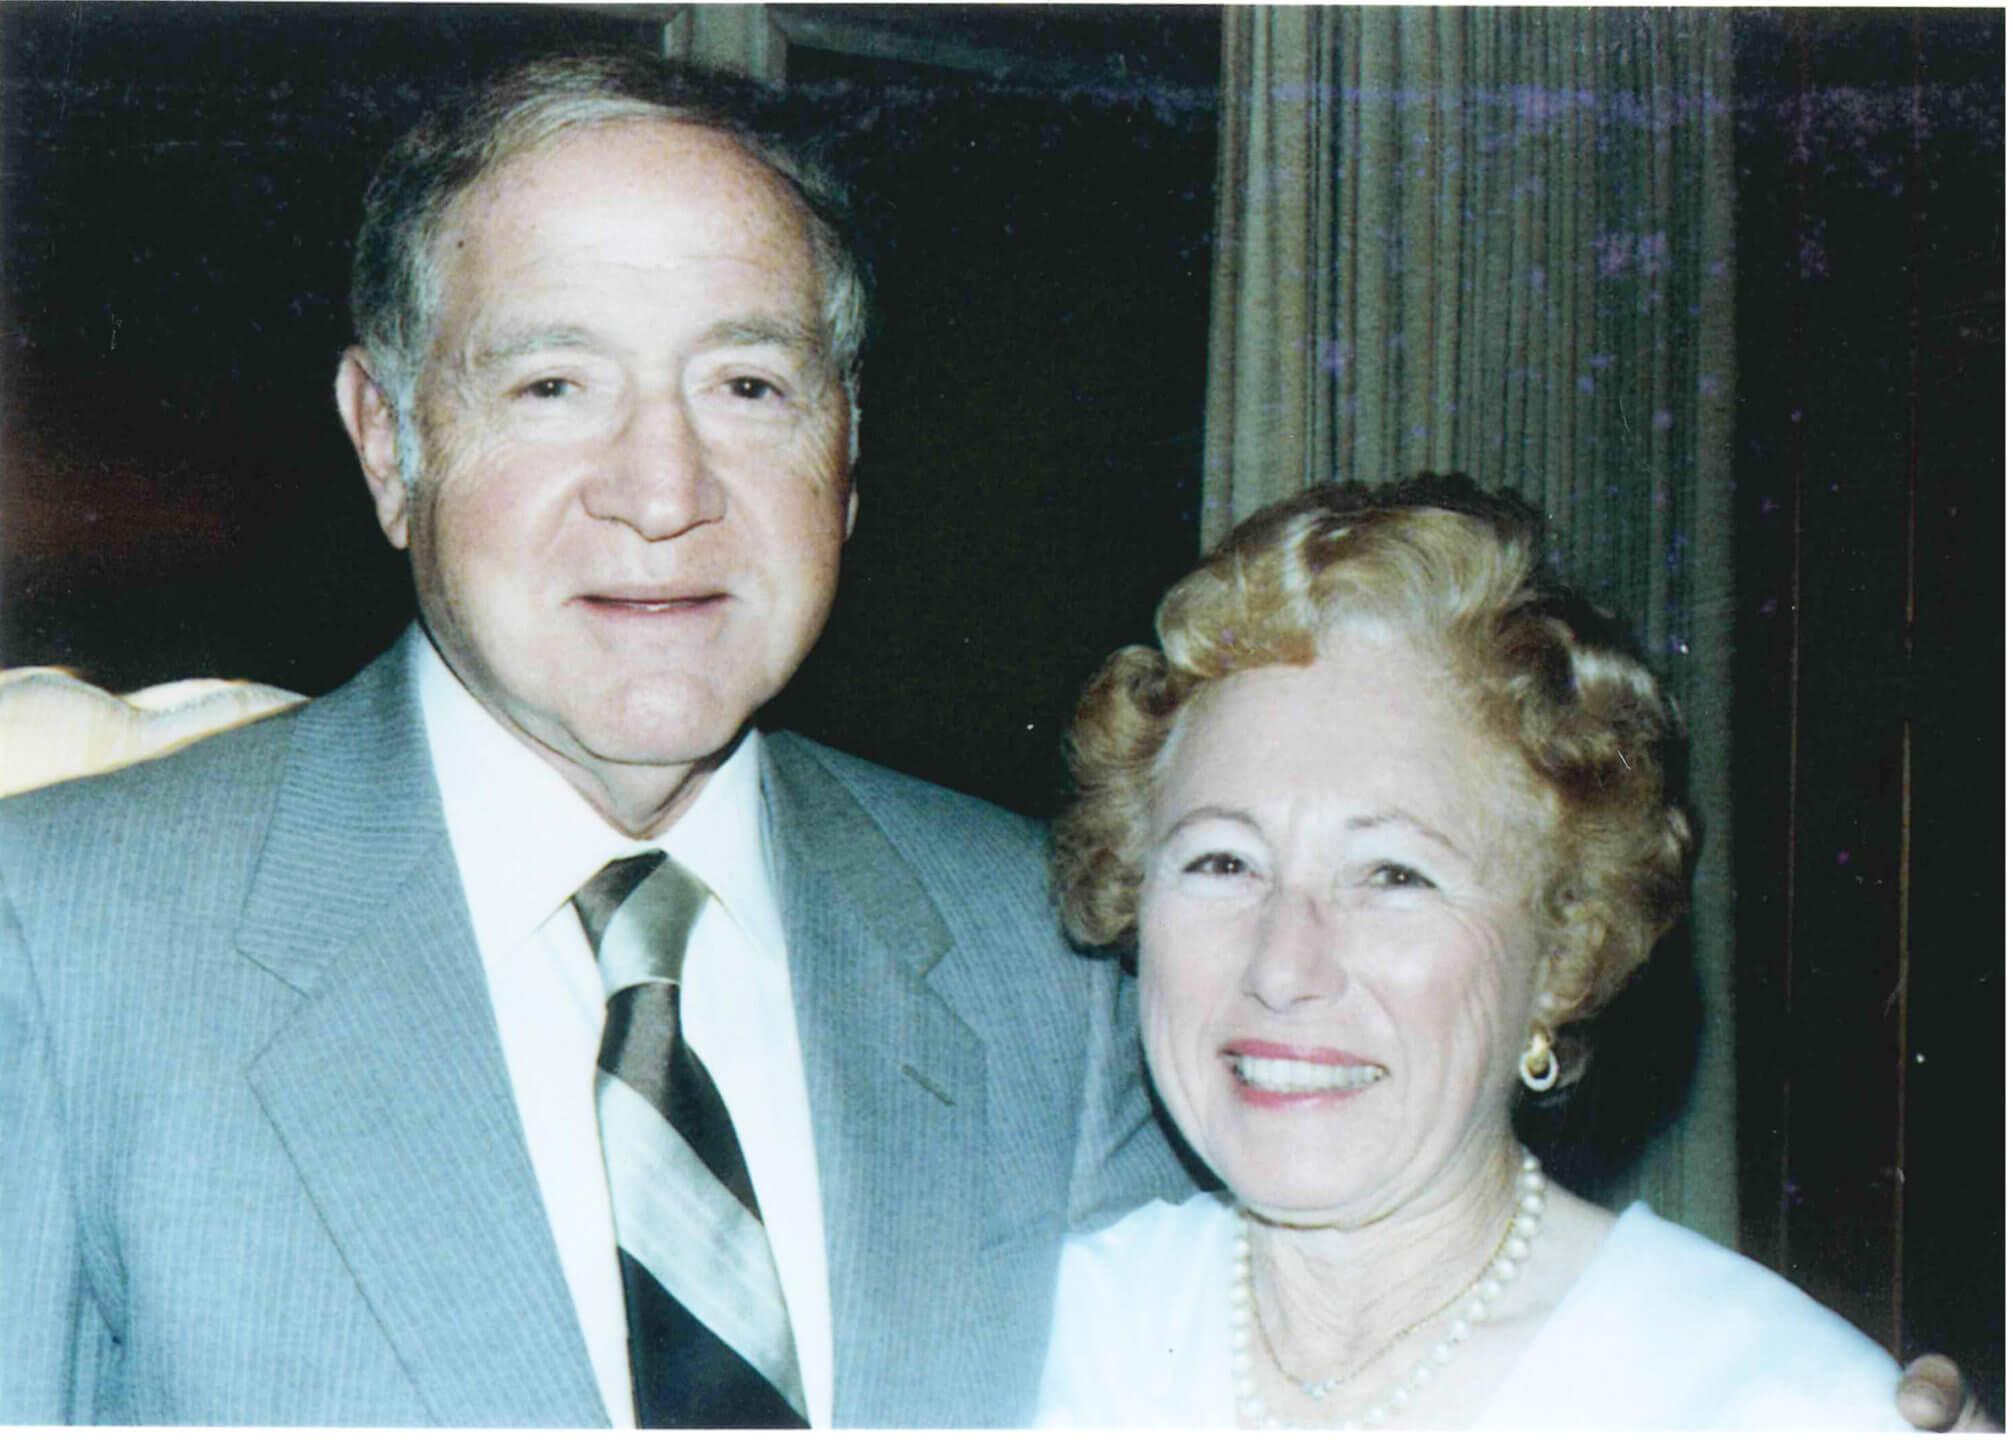 Lester Wishnatzki and his wife Selma